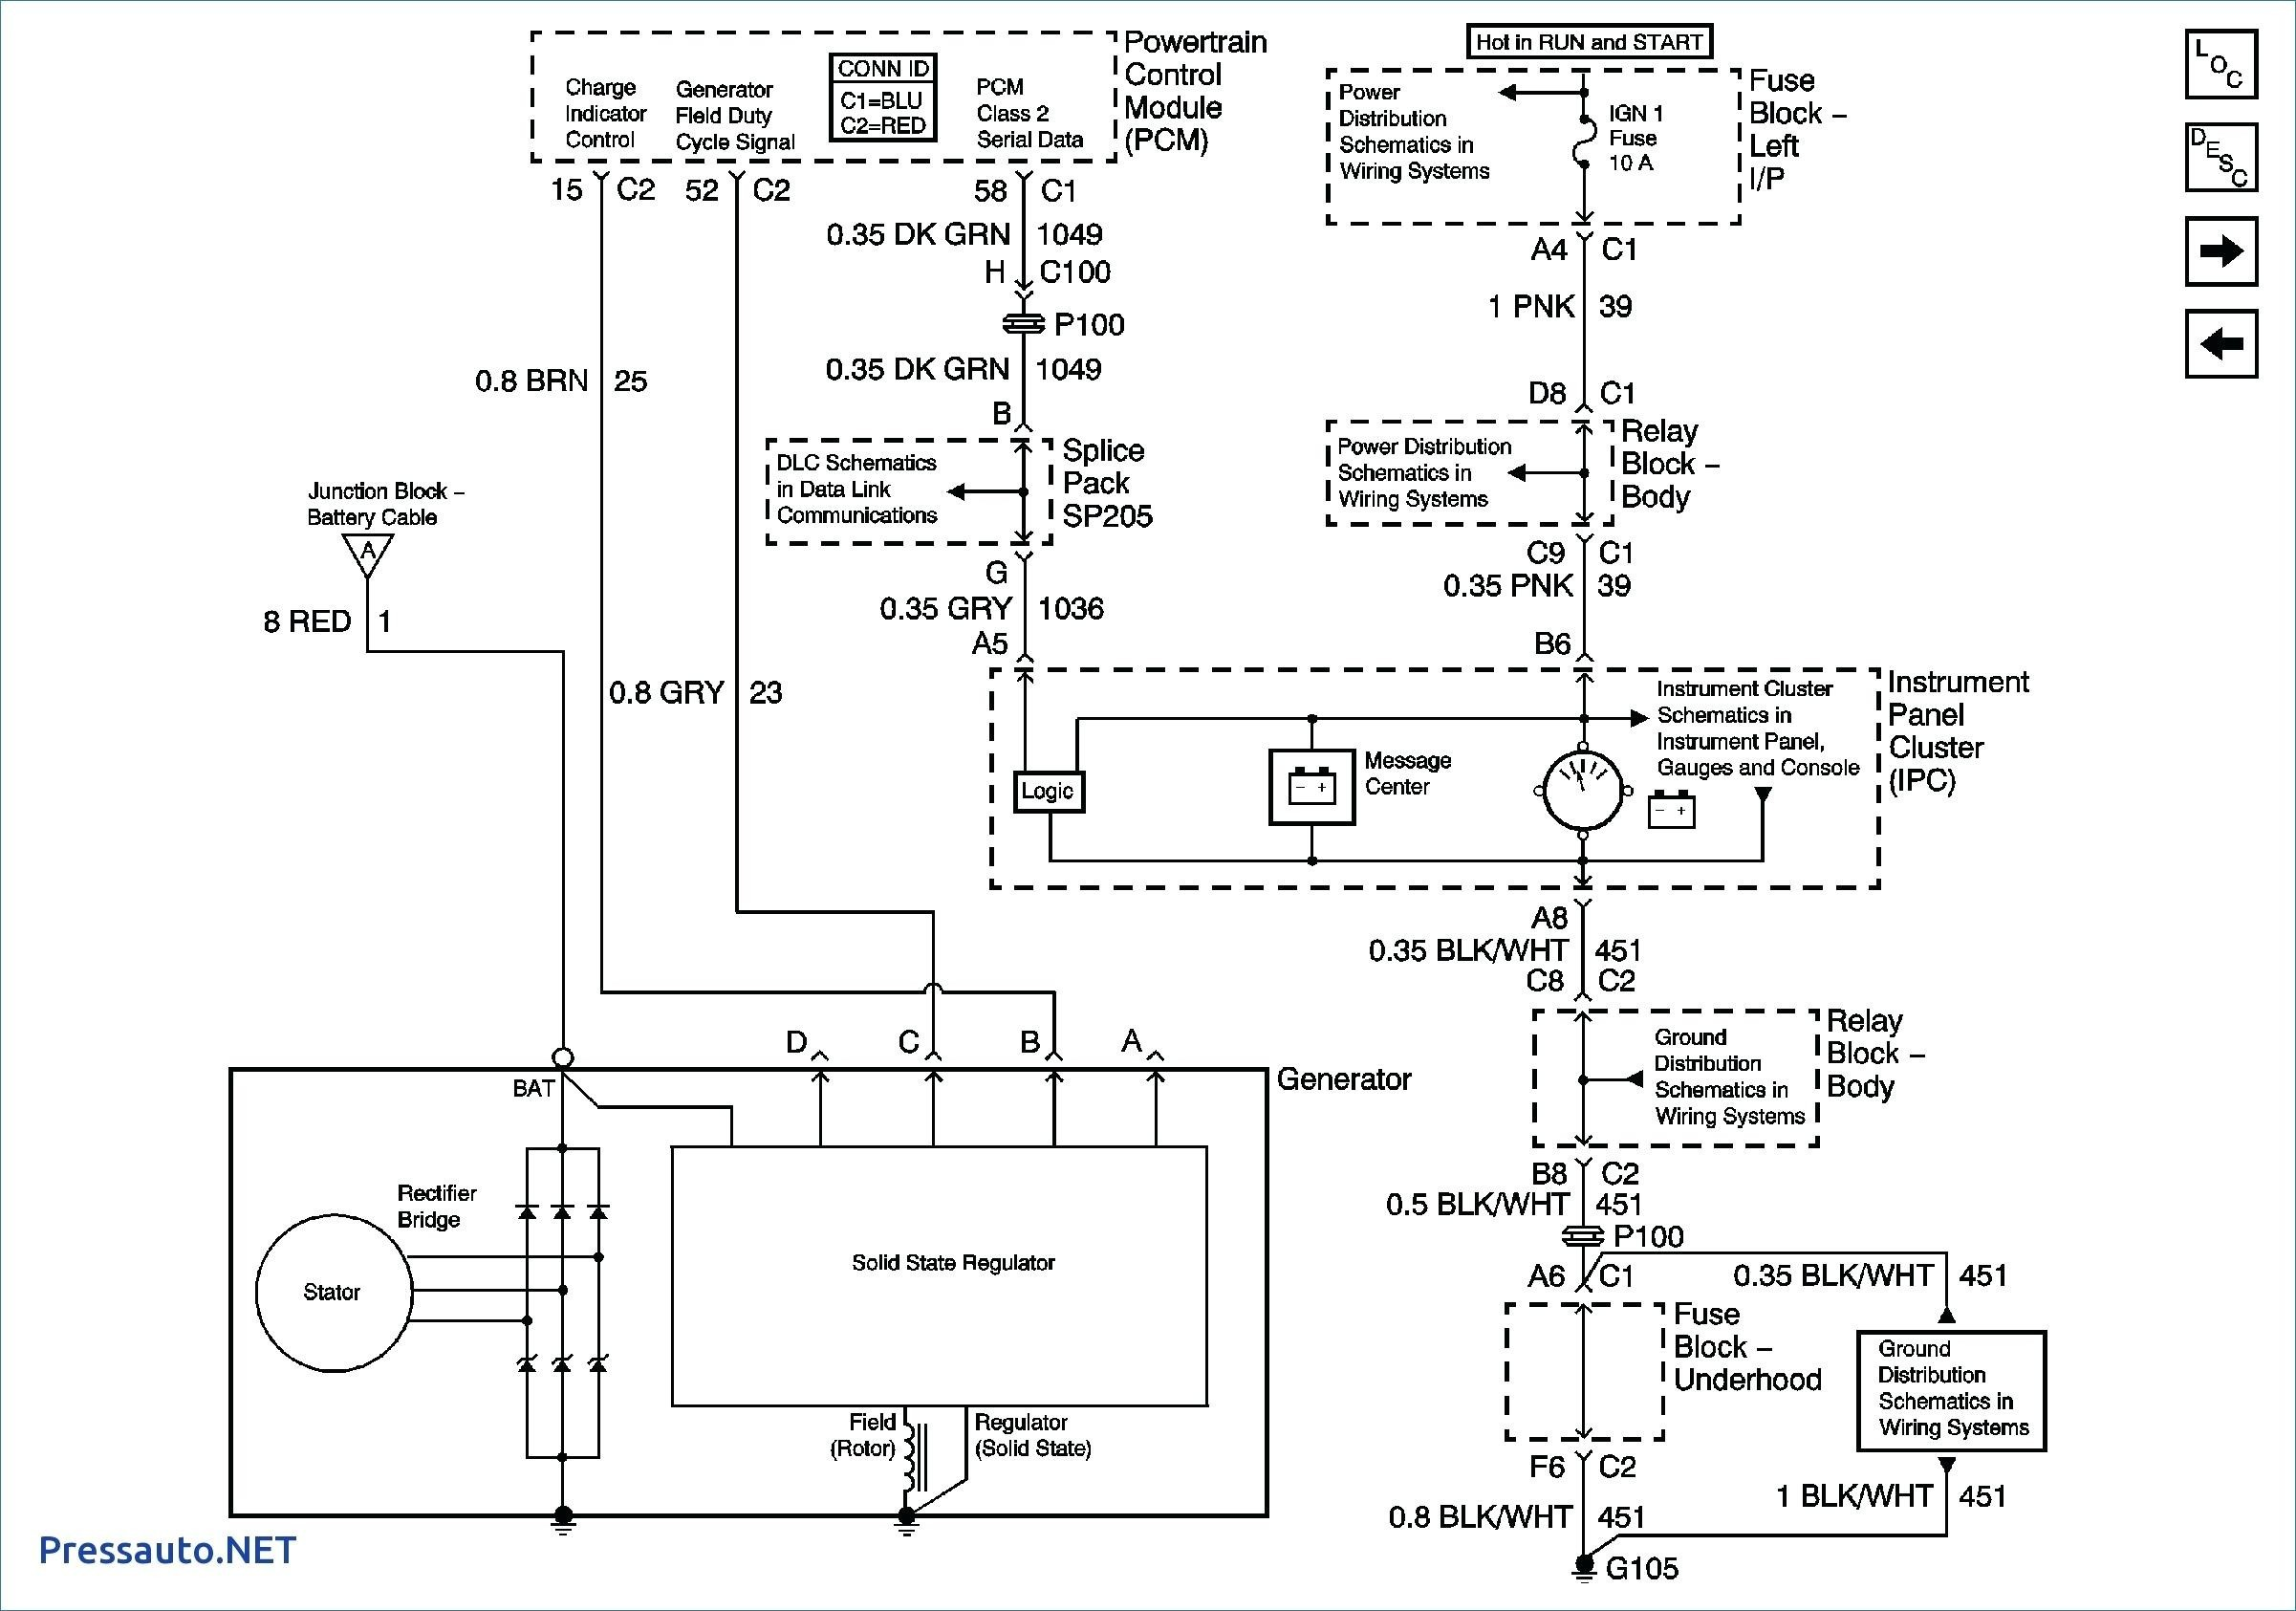 Car Alternator Wiring Diagram ford 3 Wire Alternator Diagram Car Wiring Explorer Fuse Panel Inside Of Car Alternator Wiring Diagram